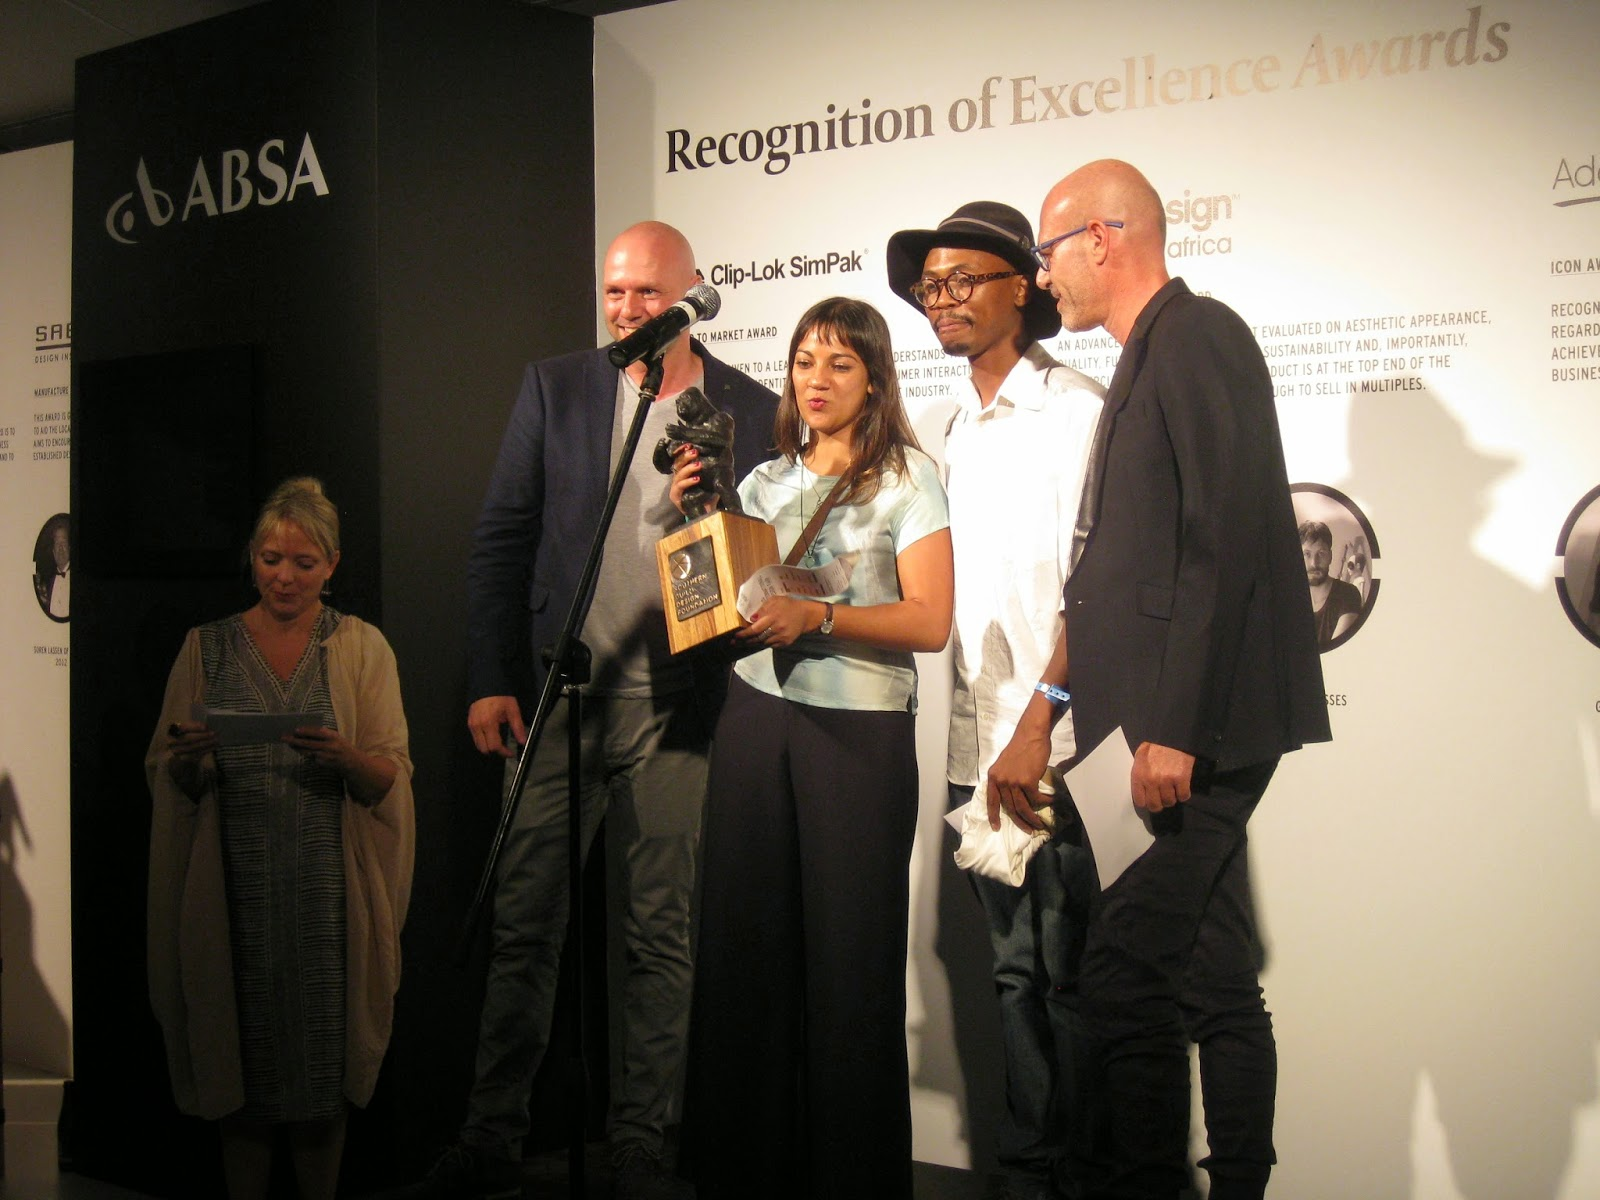 Apprentice Award Gewinnerin Nehanda Magan